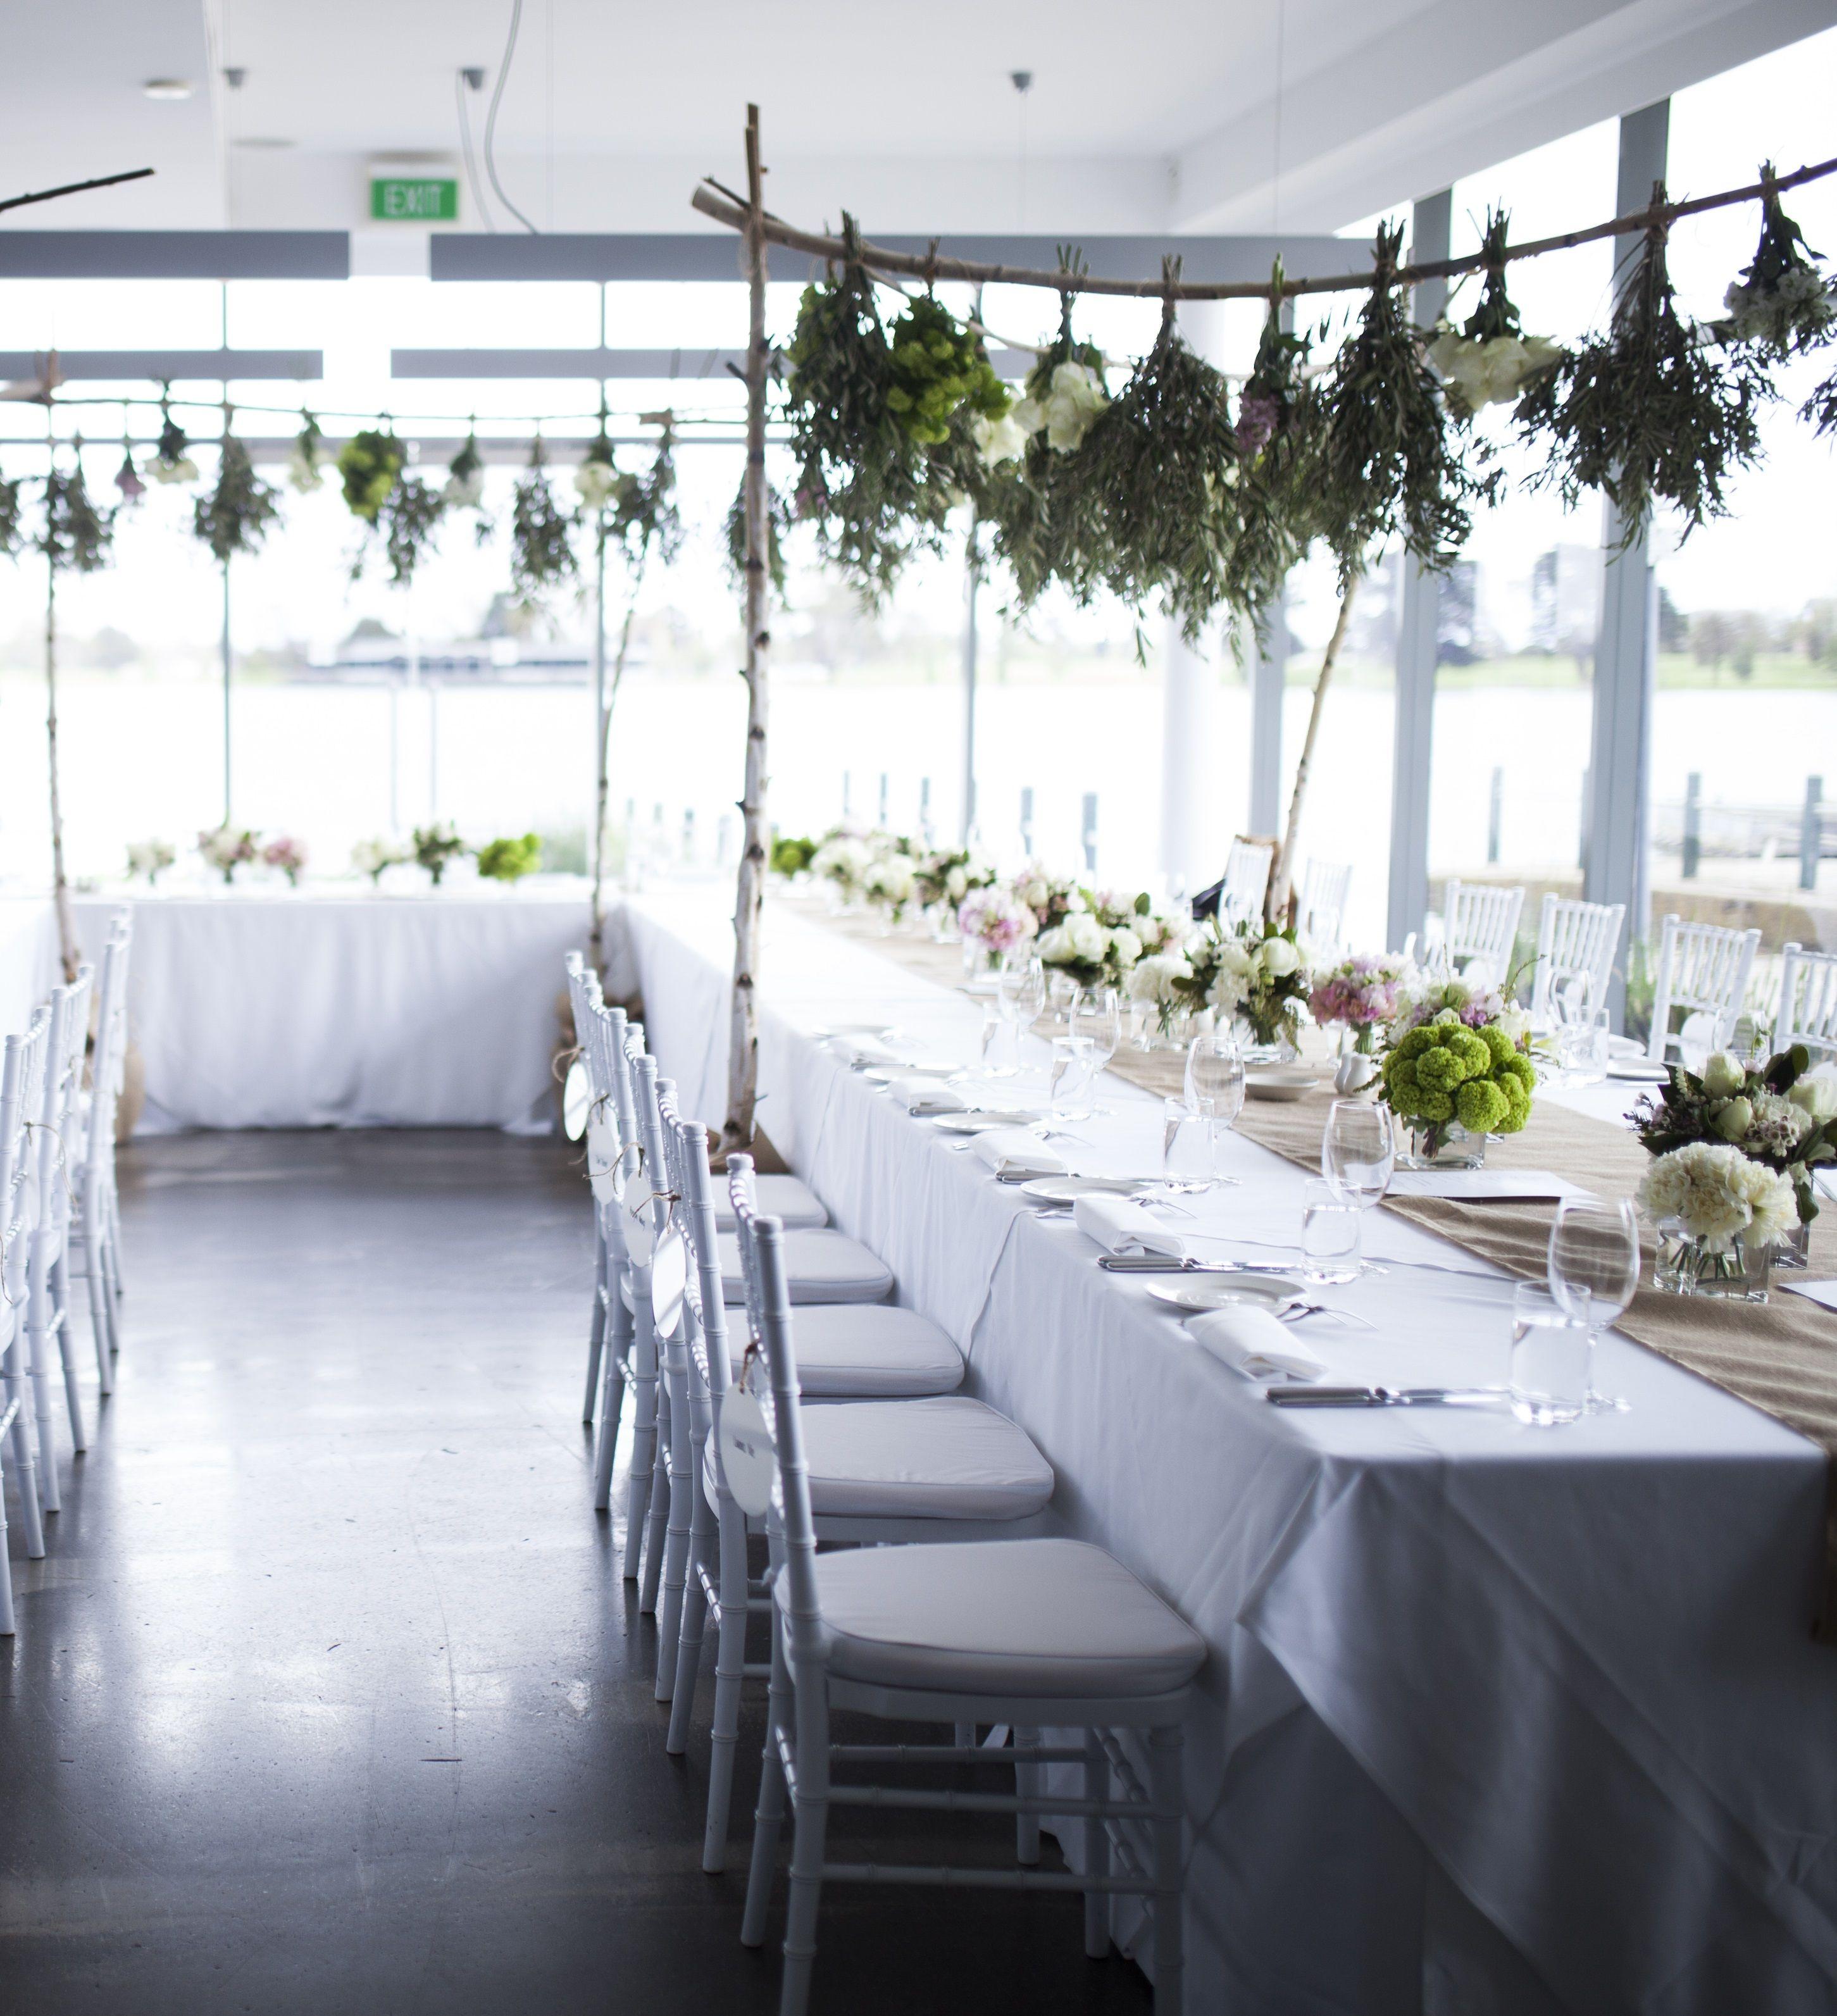 U shape table setting in our Lake Room #thepointalbertpark #wedding #weddingvenue #tablesetting #weddinginspo #weddingdeas #weddingchairs #weddingflowers #melbournevenue #functions